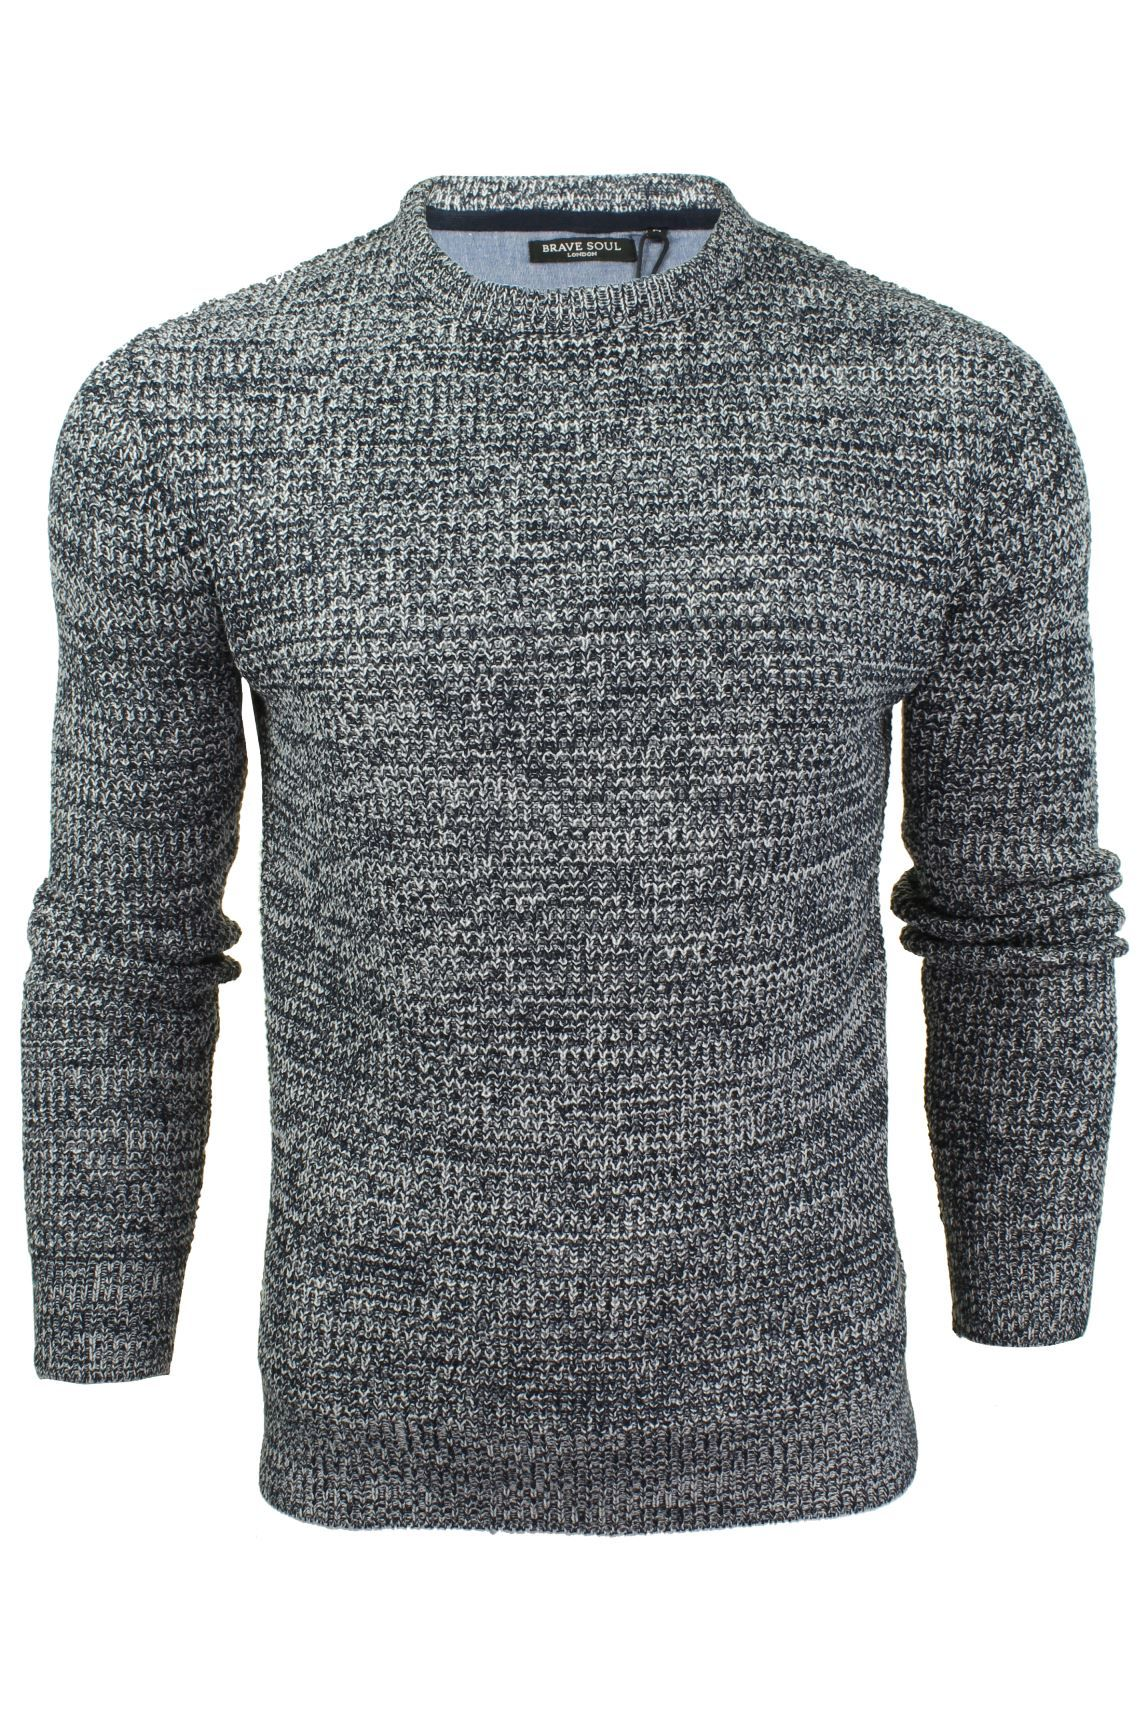 68090d0159f sweaters for men mens jumpers sweaters men men sweaters knit men ...